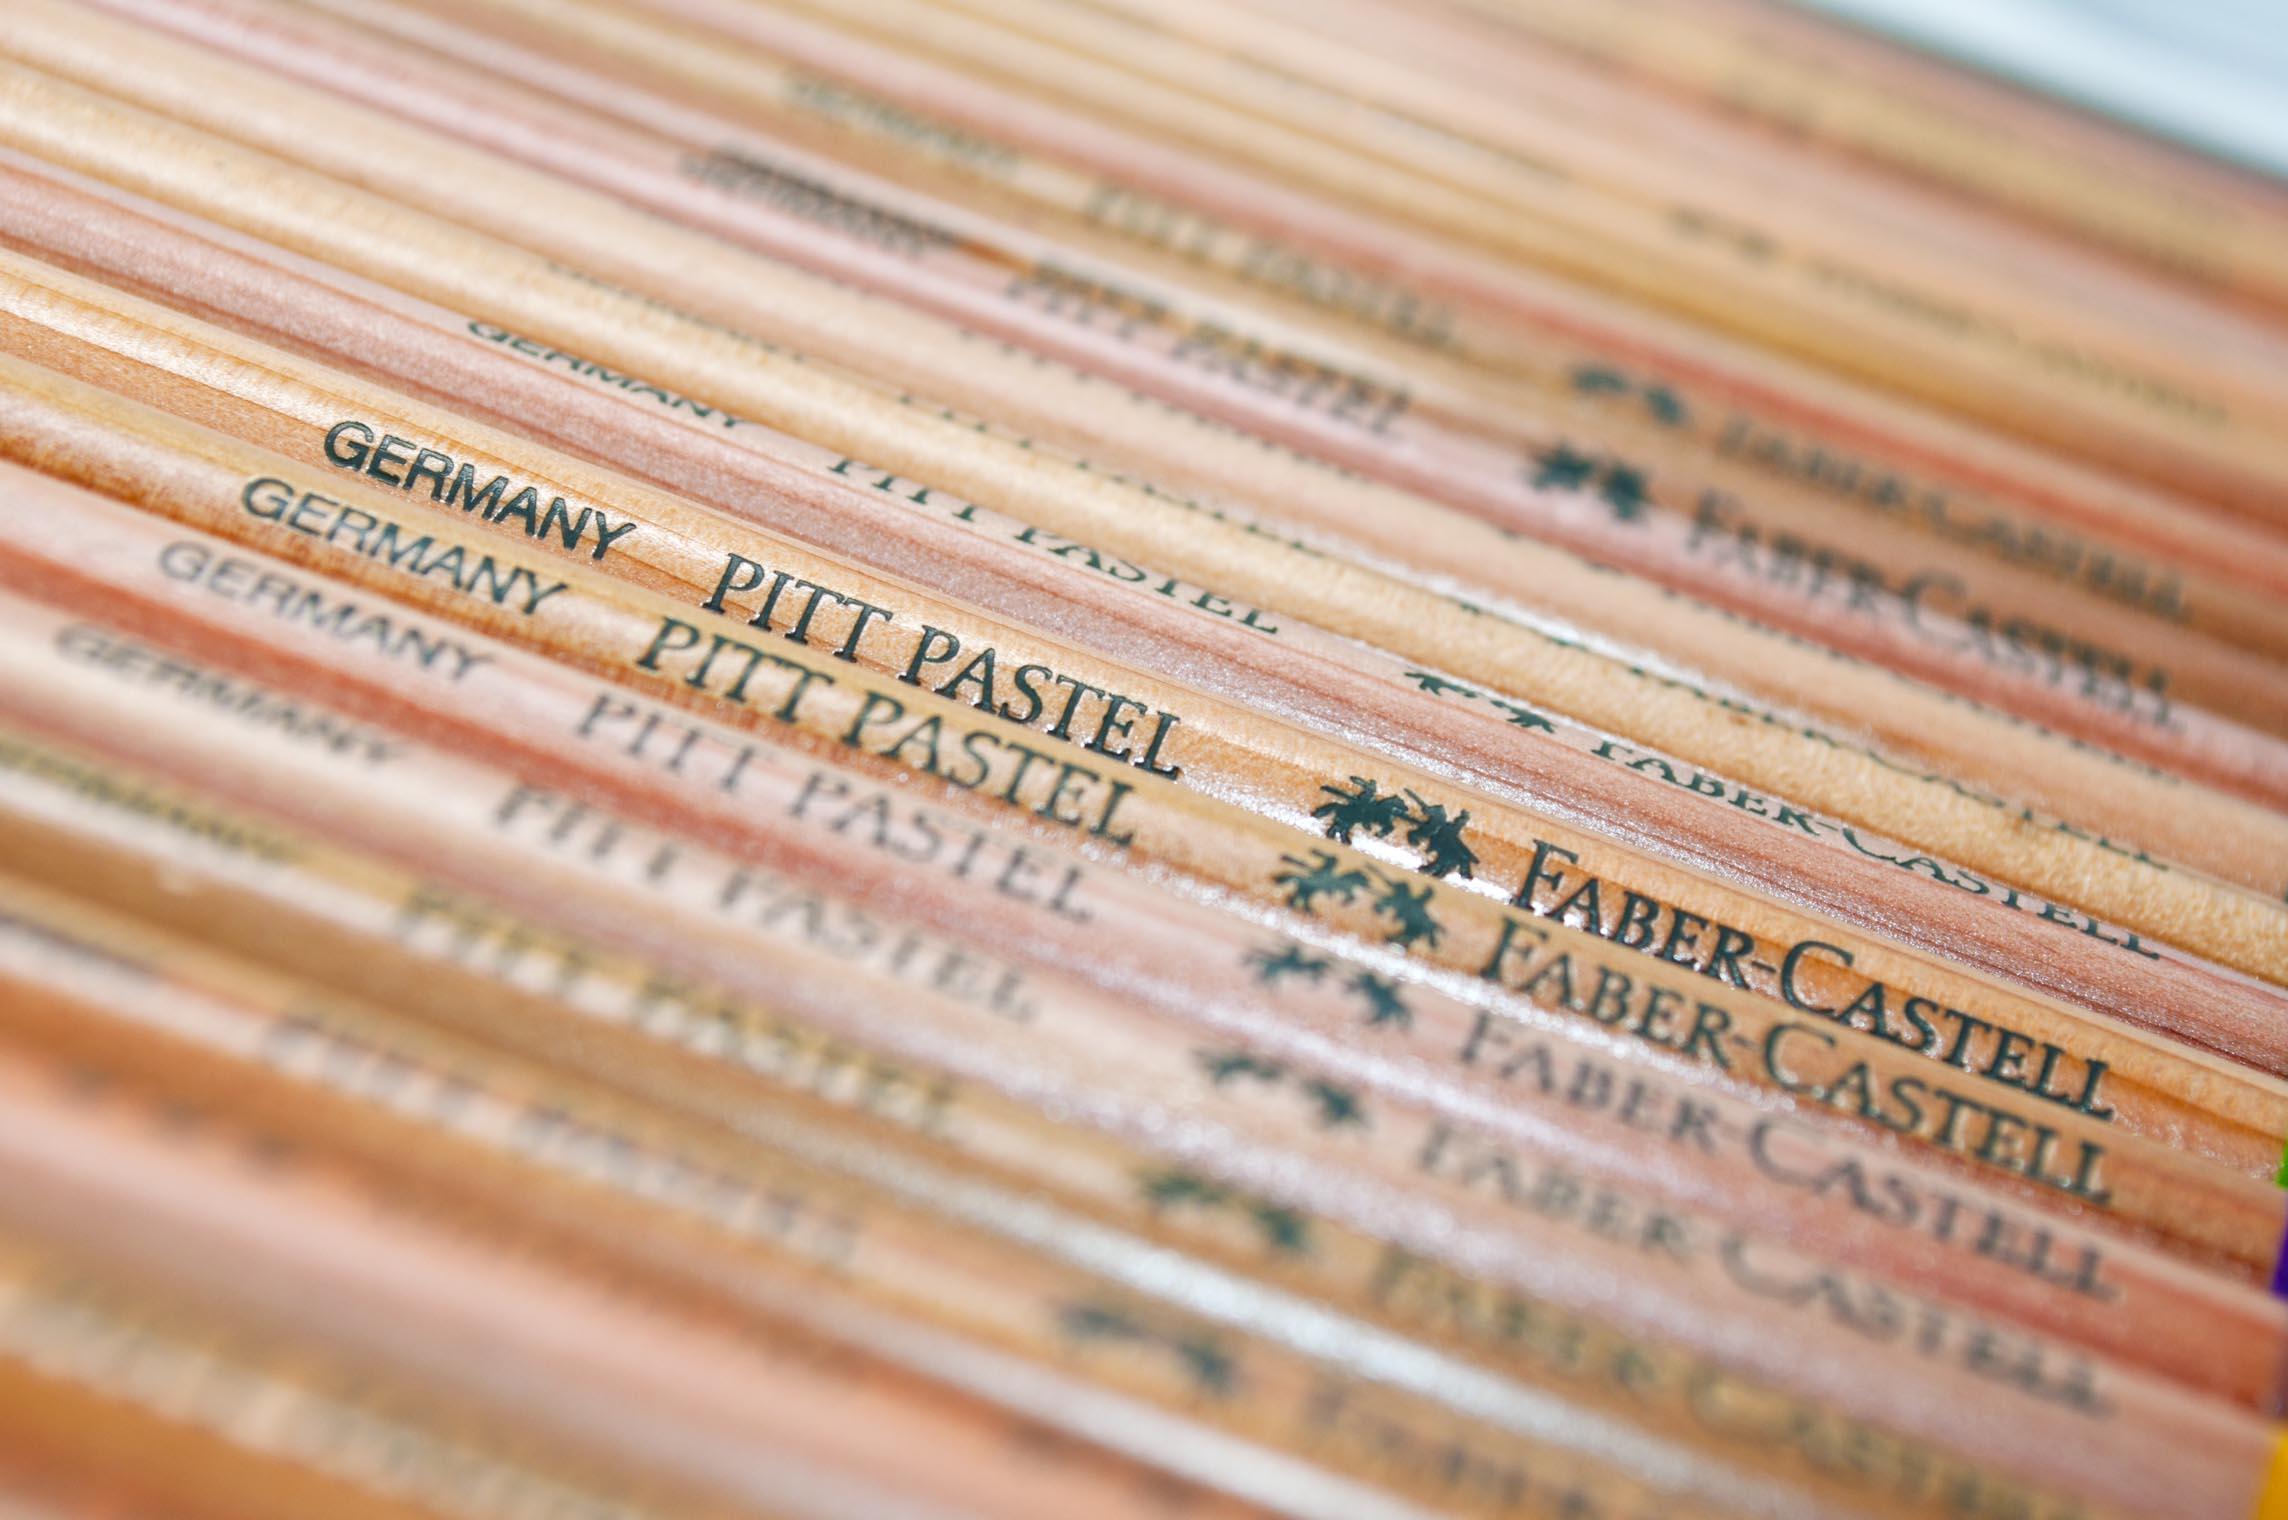 Faber Castell Pitt Pastel Wood Grain Barrel